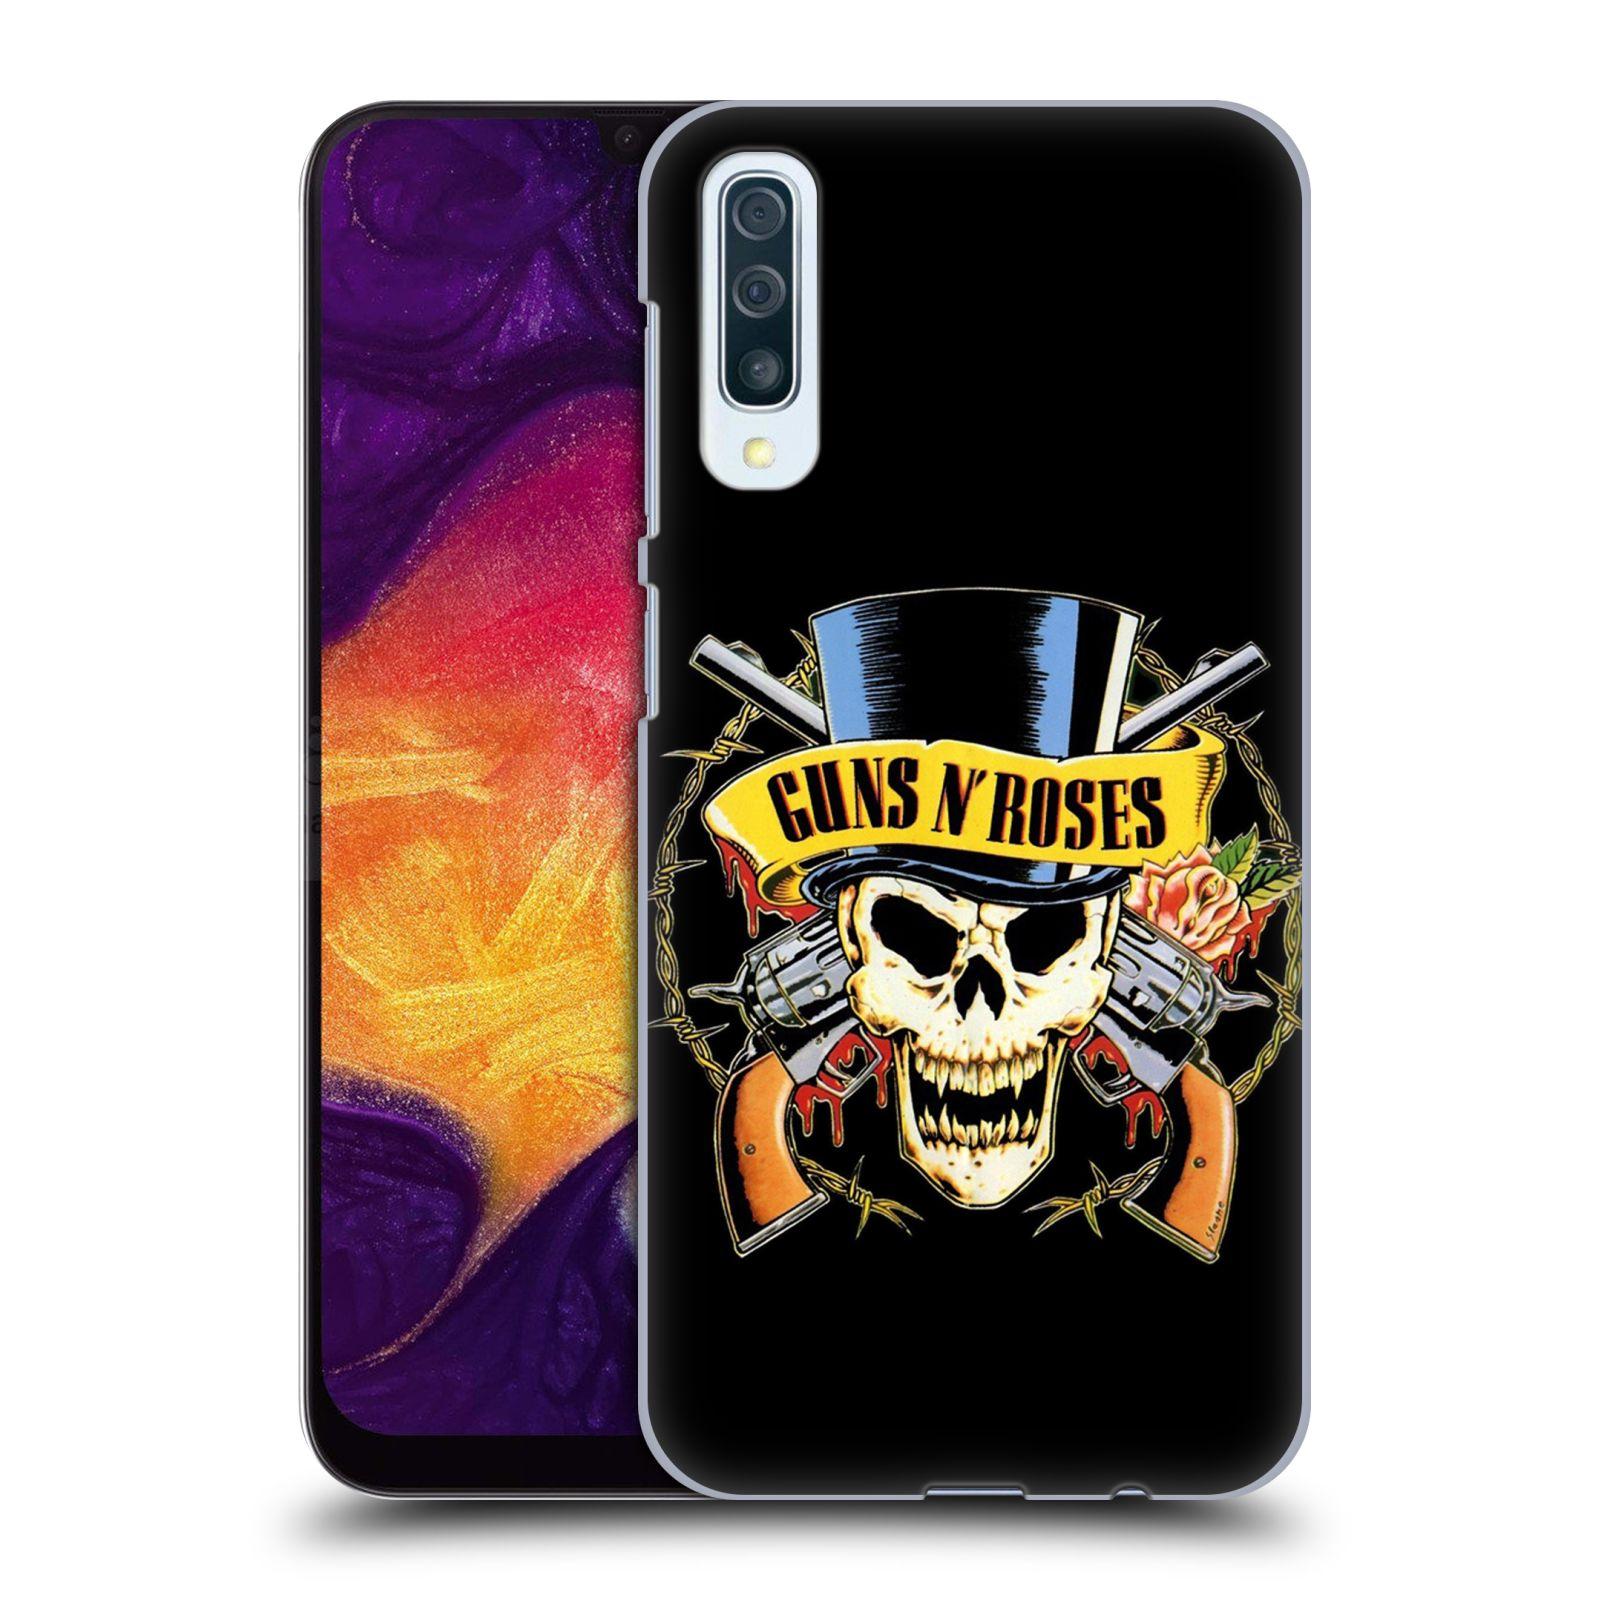 Plastové pouzdro na mobil Samsung Galaxy A50 / A30s - Head Case - Guns N' Roses - Lebka